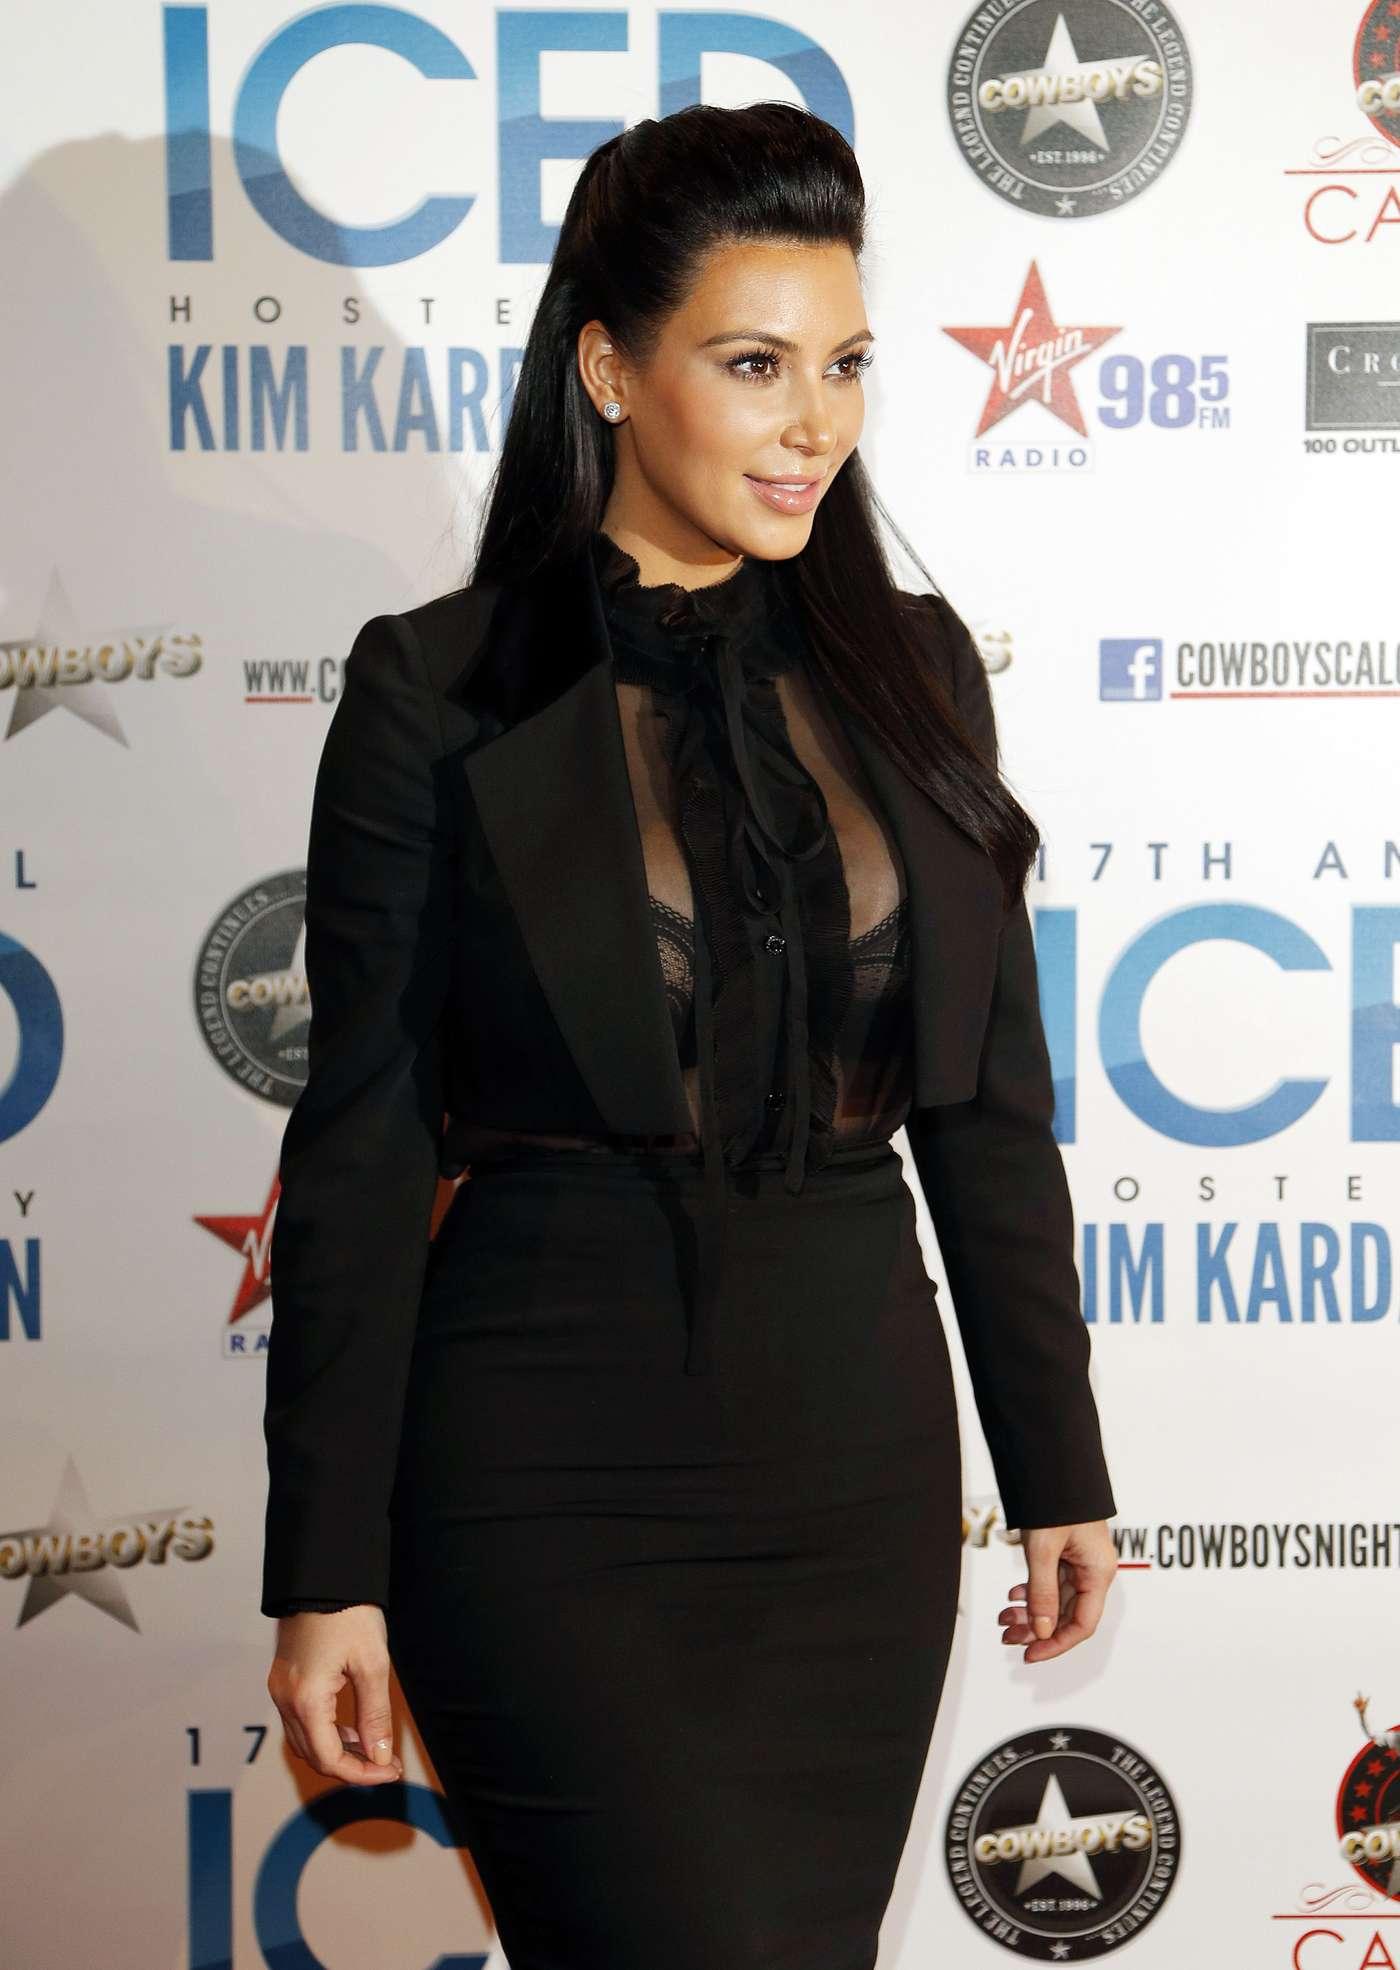 Dress black kim kardashian - Kim Kardashian At Cowboys Iced Event 03 Full Size